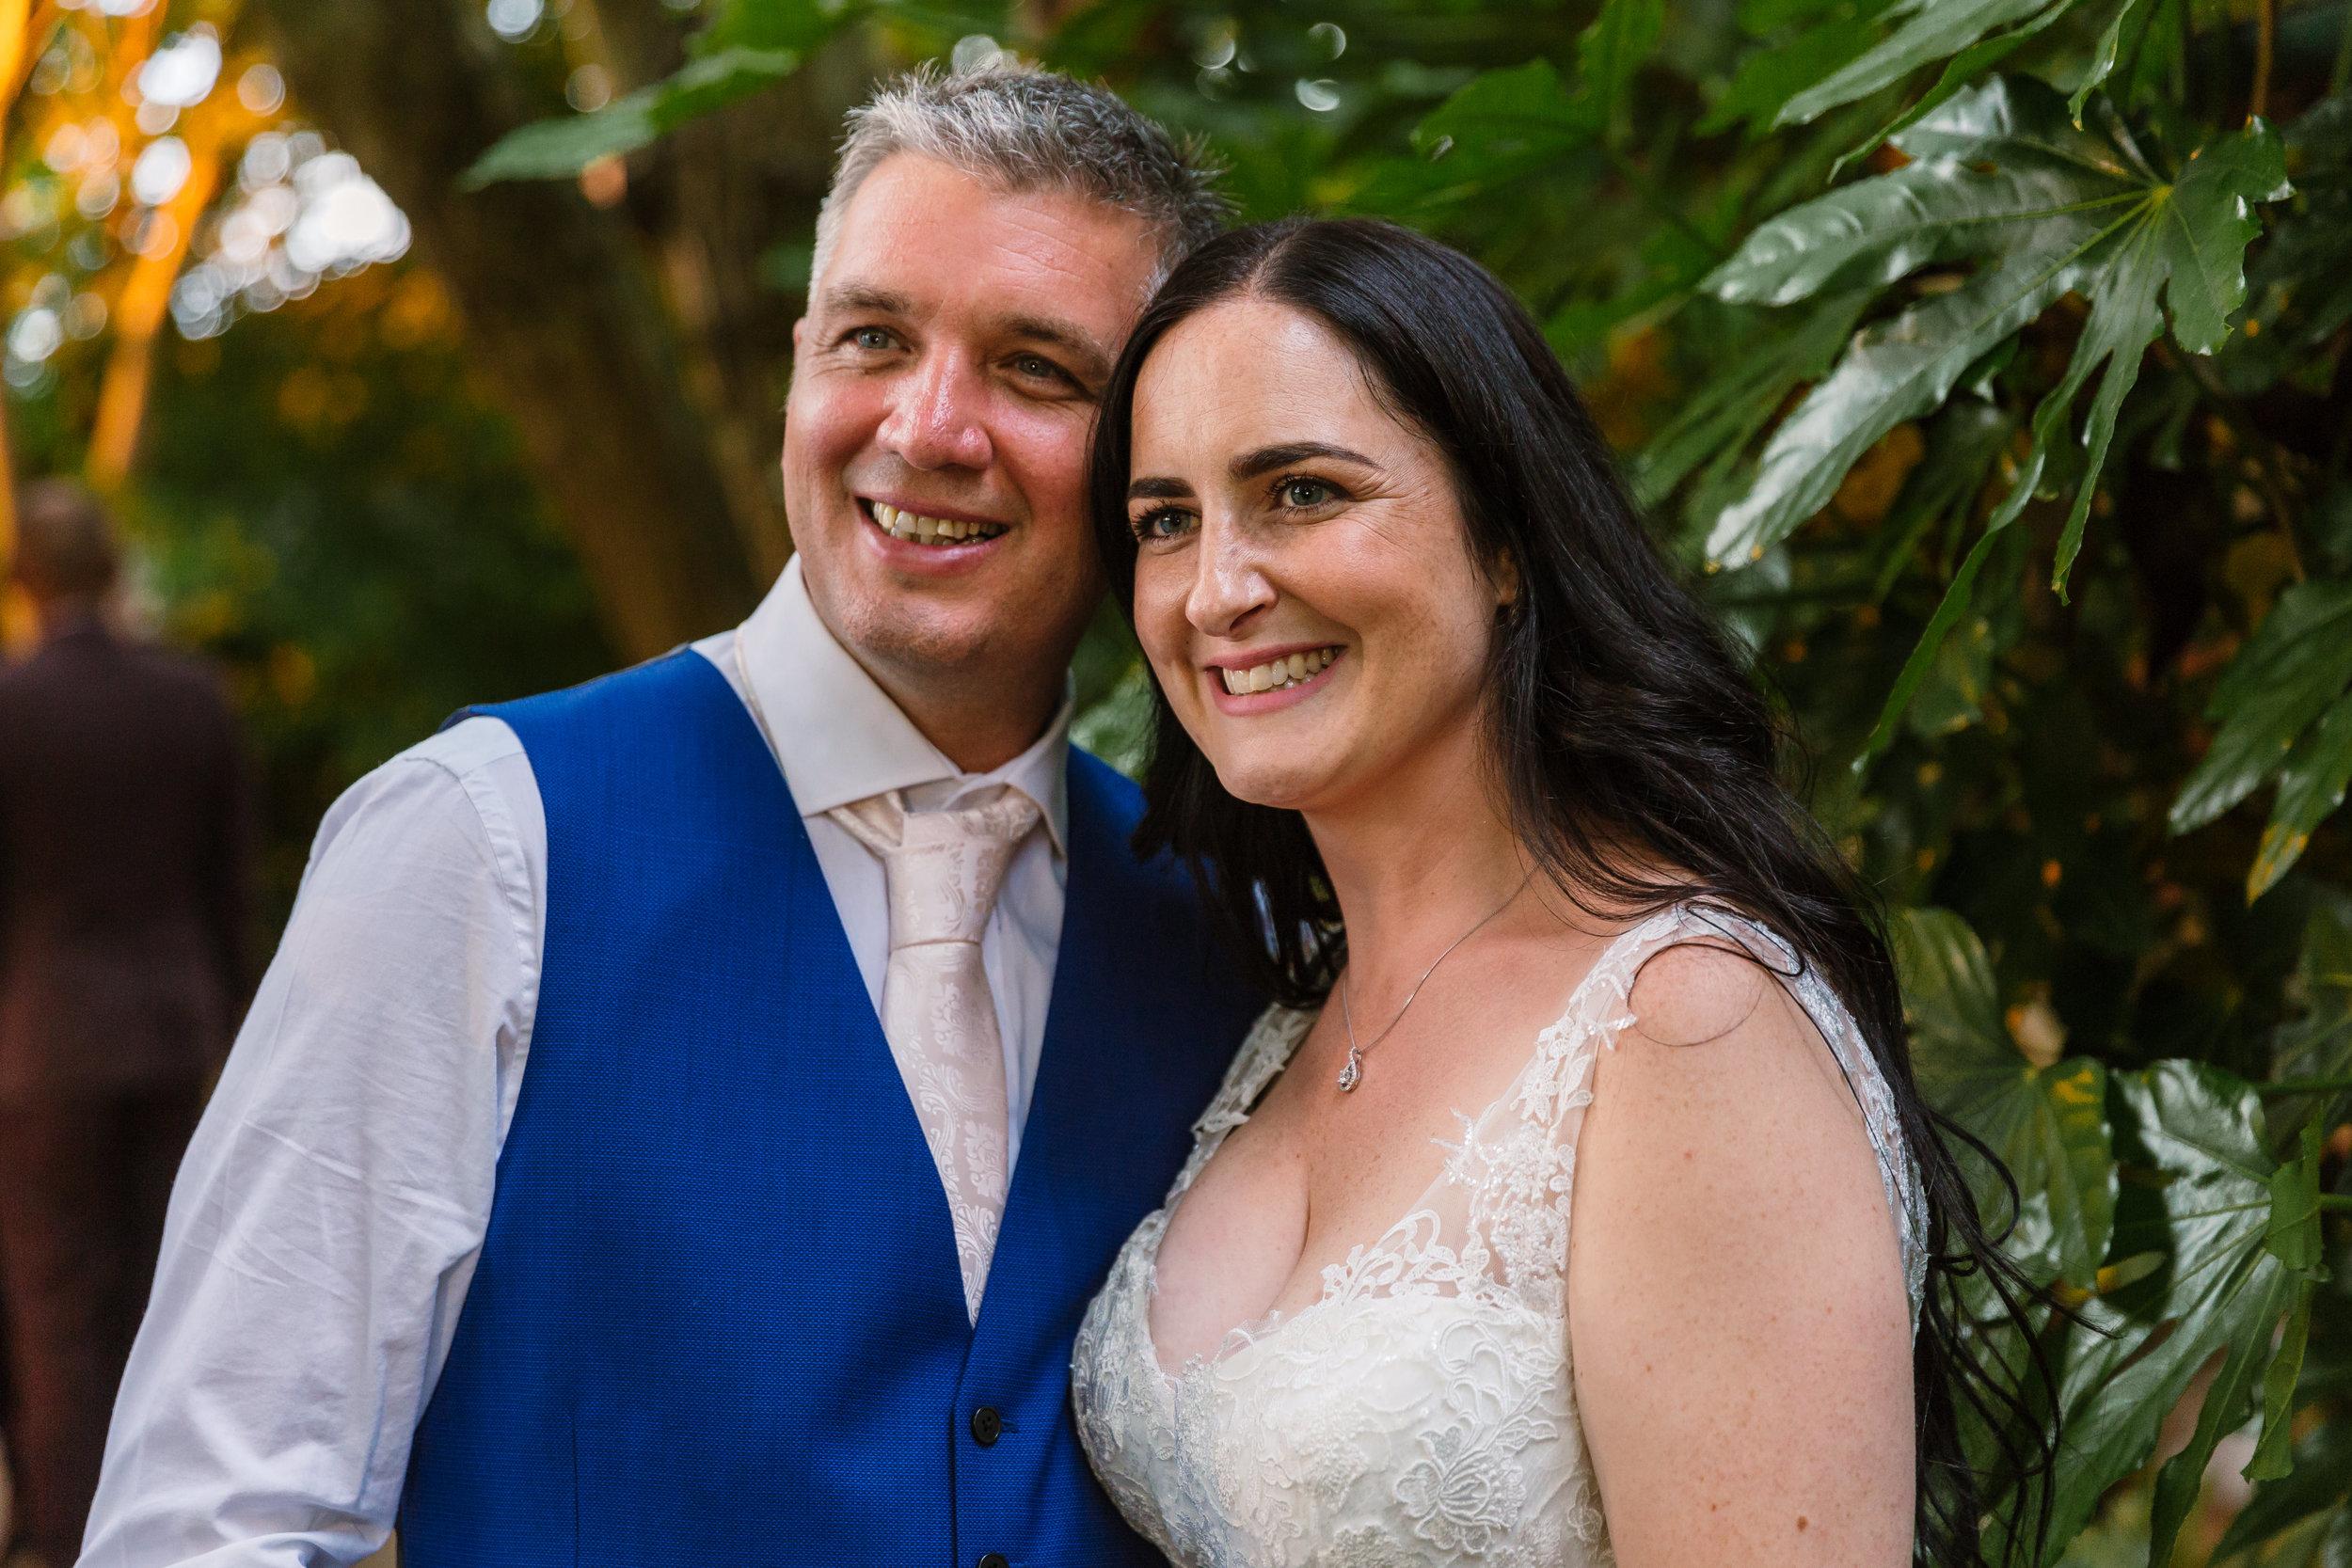 Sarah-Fishlock-Photography : Hampshire-wedding-photographer-hampshire : fleet-wedding-photographer-fleet : Meade-Hall-Wedding-Photographer : Meade-Hall-Wedding-Photos-1040.jpg